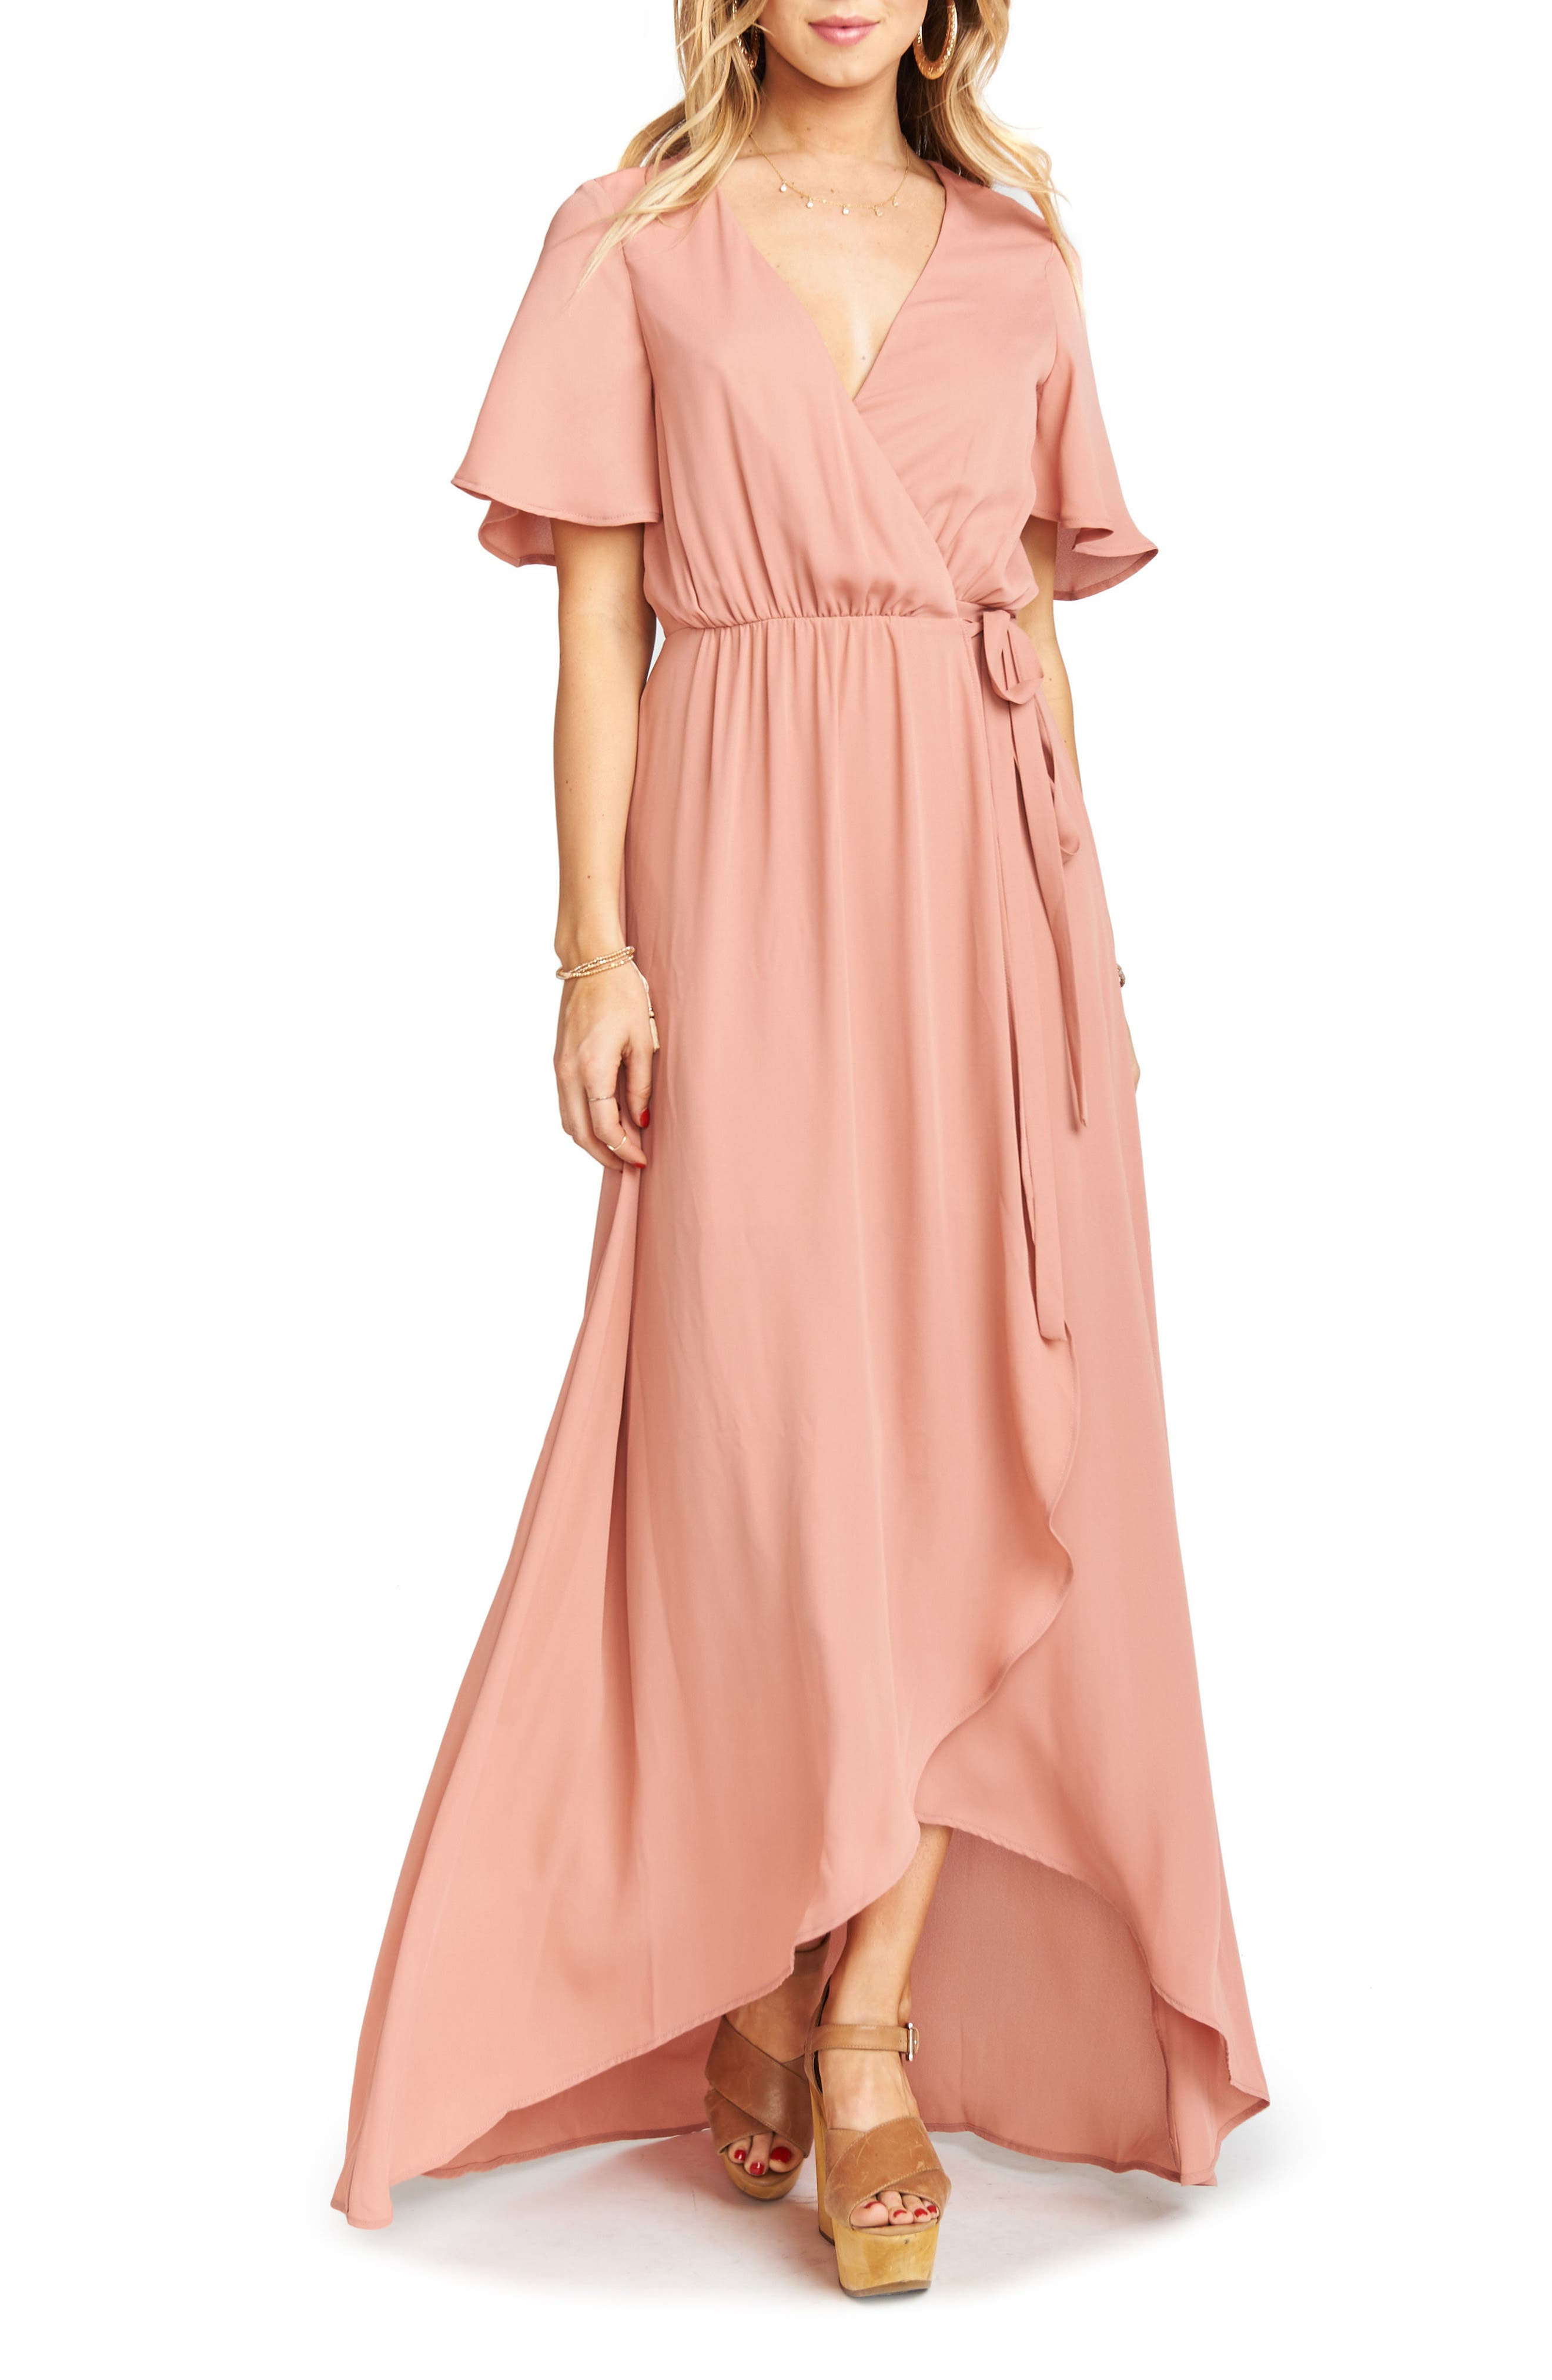 Alternate Image 1 Selected - Show Me Your Mumu Sophia Wrap Dress